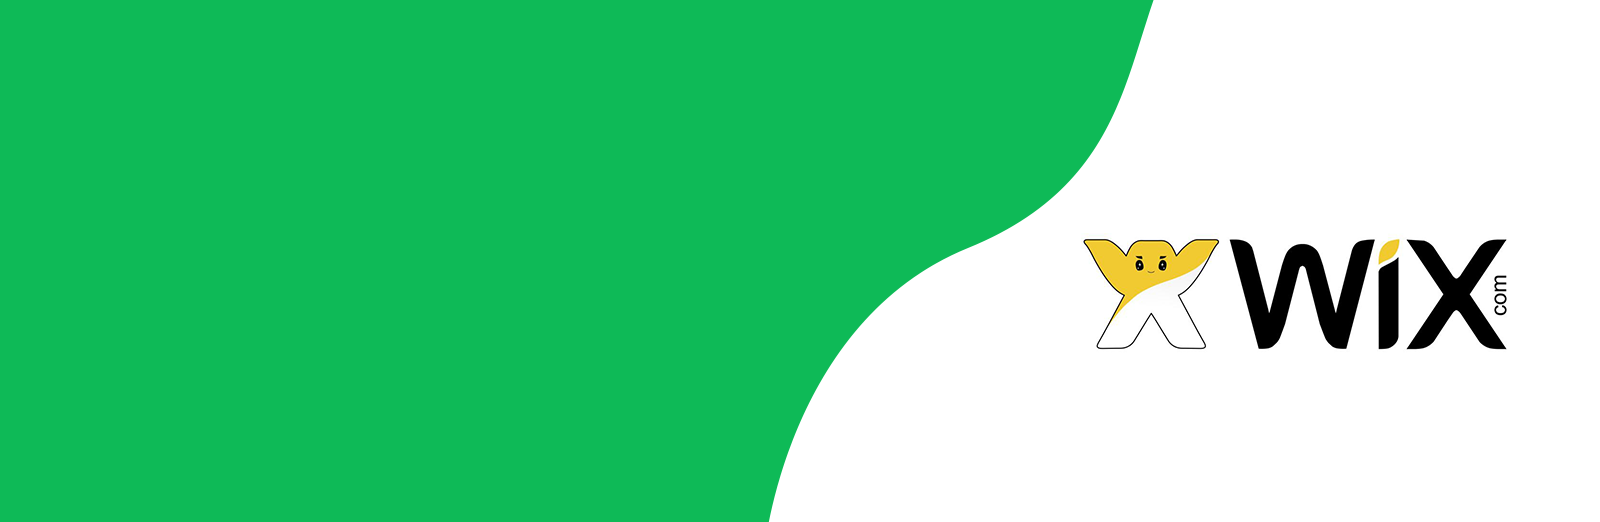 Wix Design & Development Case Study